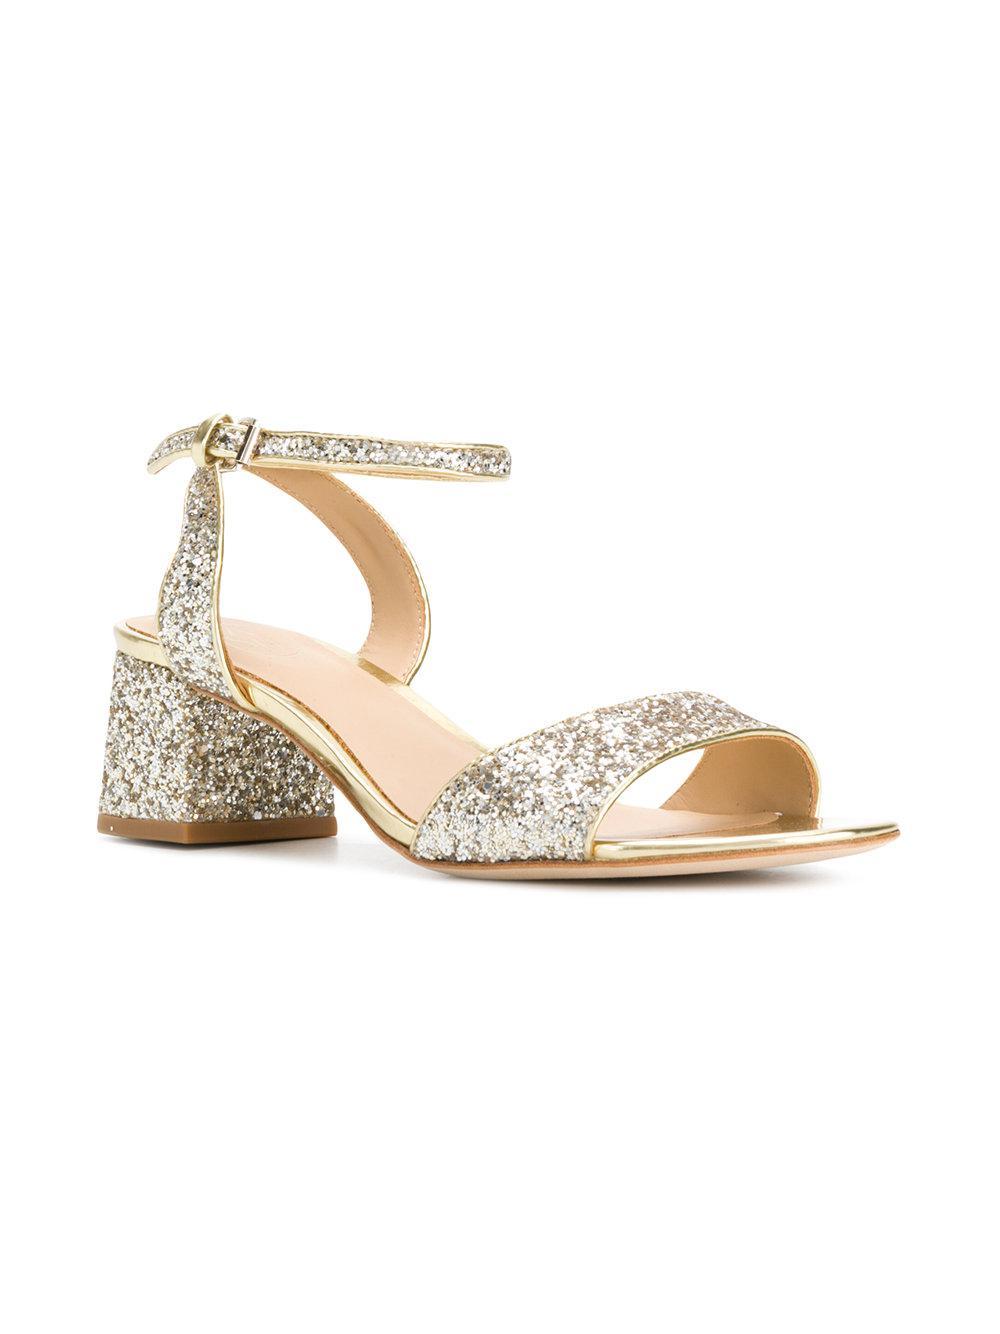 glitter block heel sandals - Metallic Ash KtB9sa